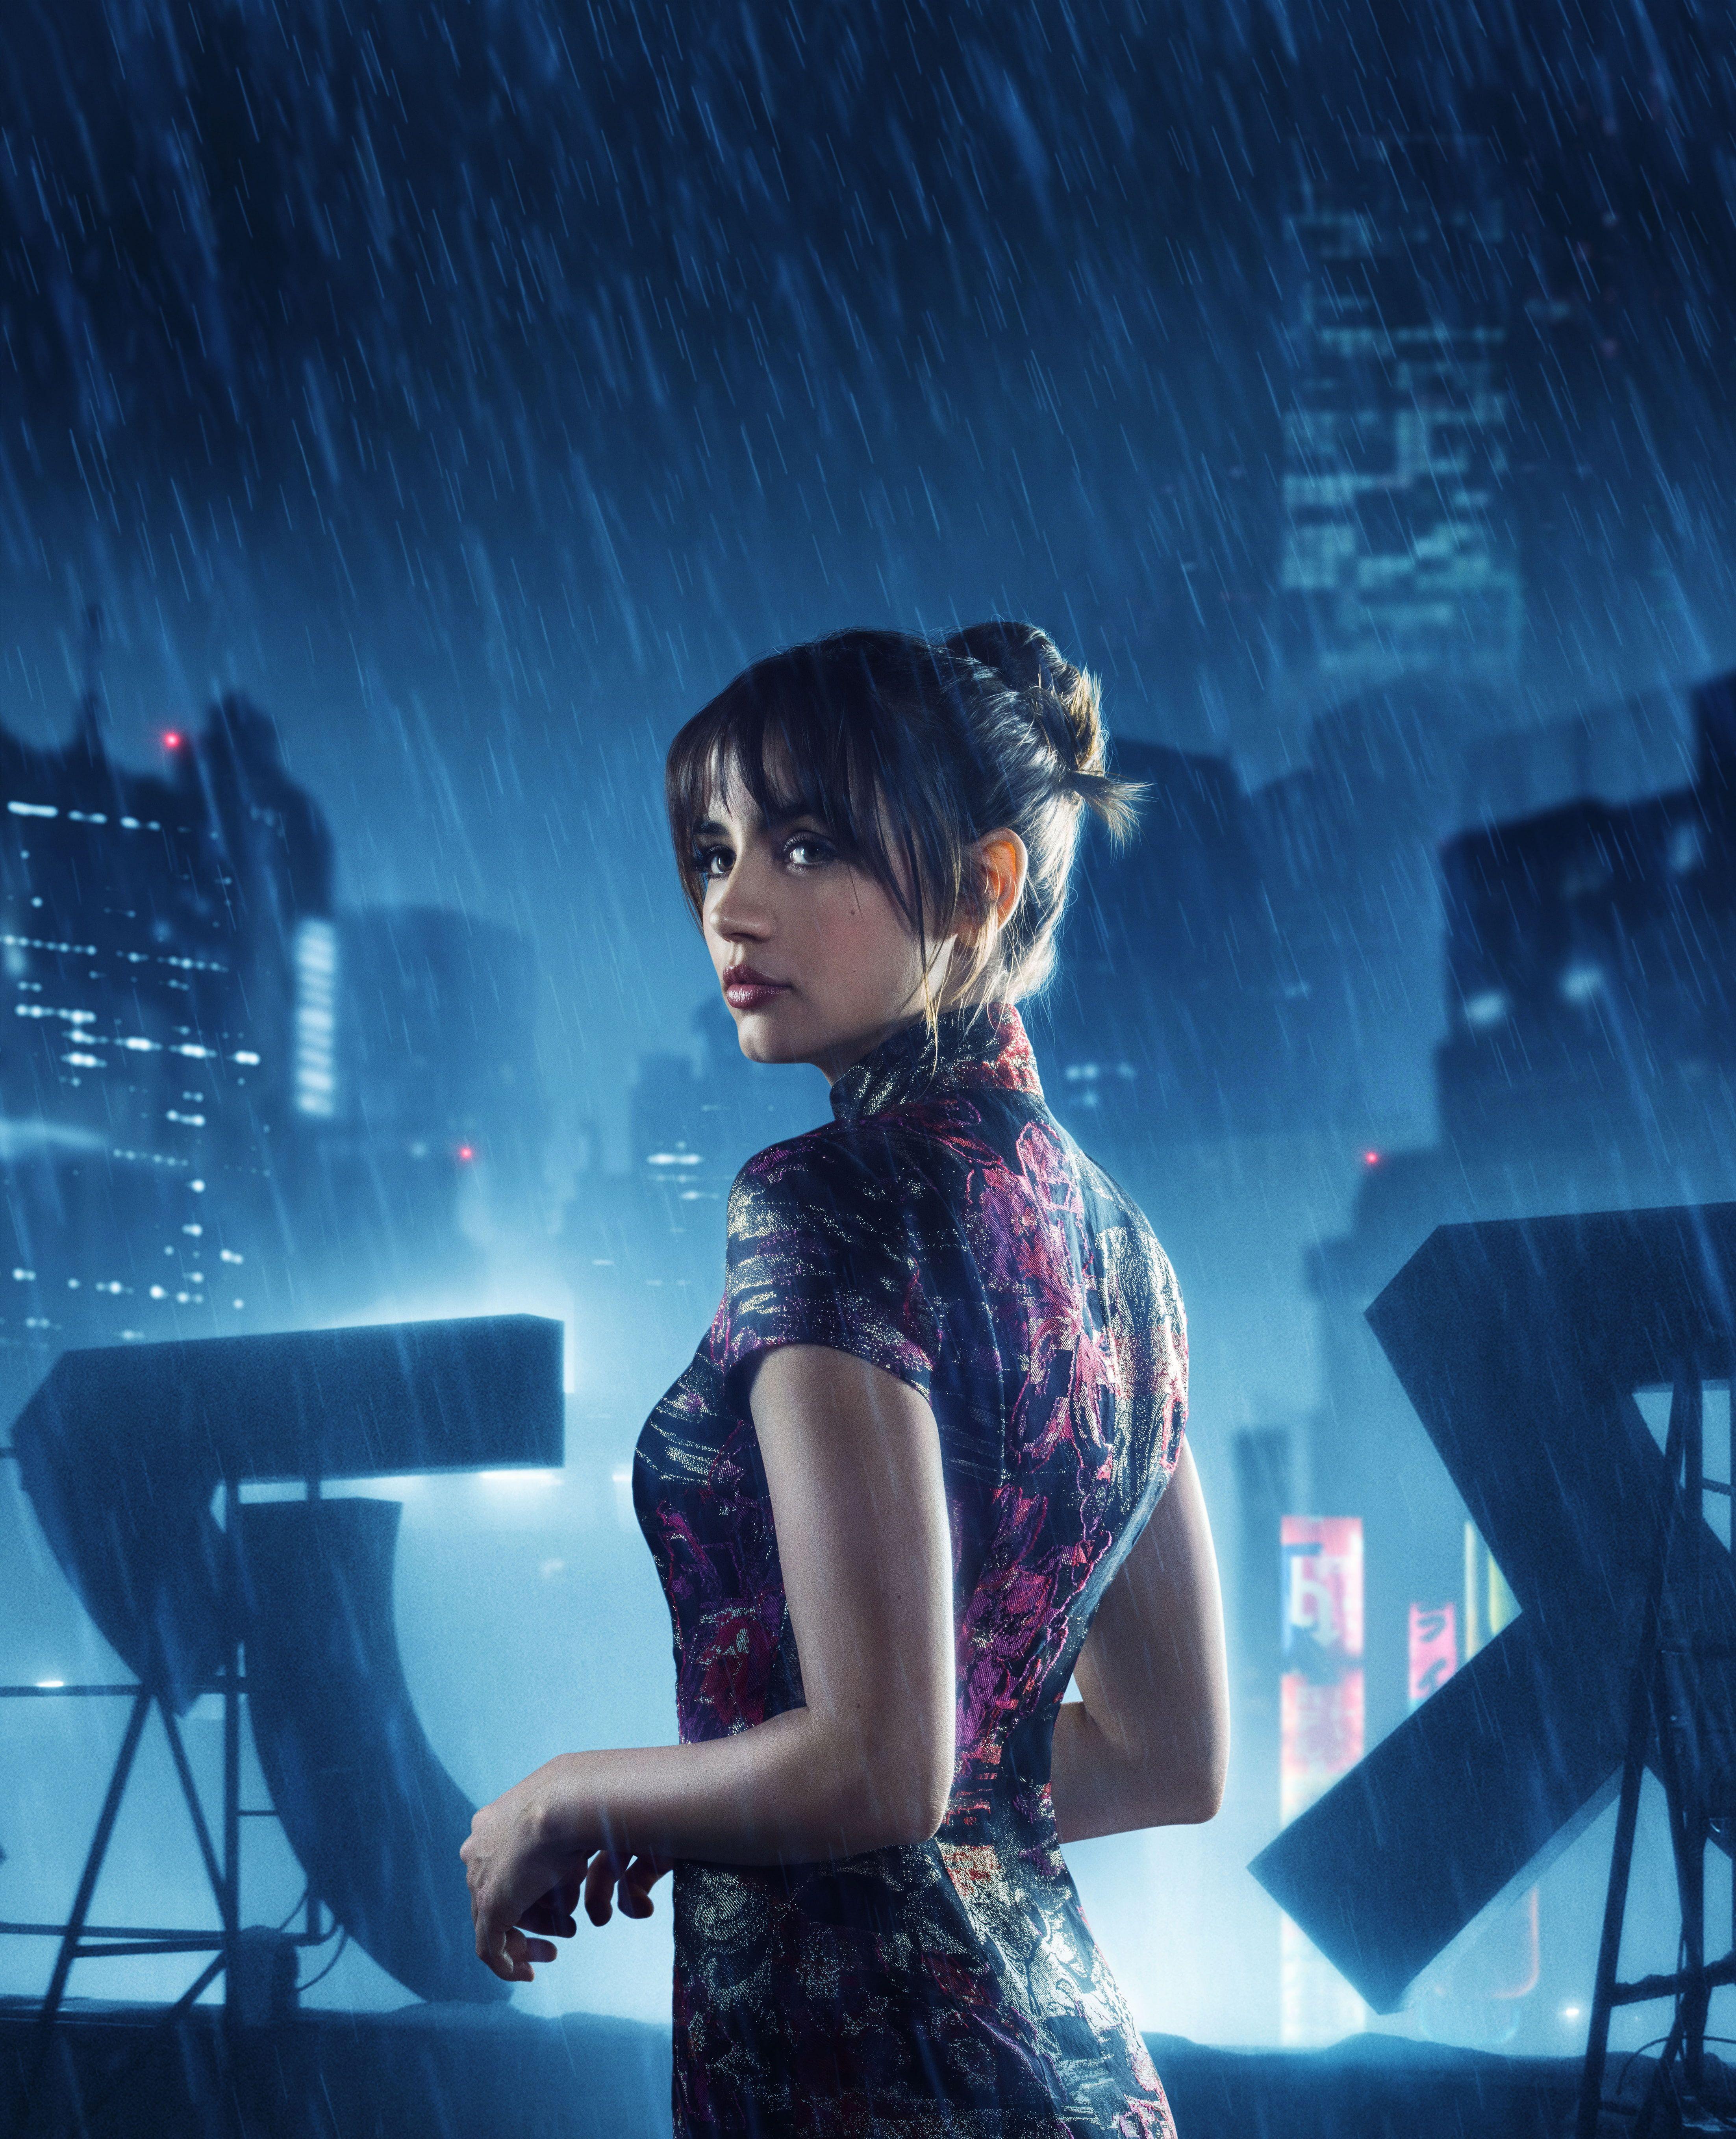 4k Joi Ana De Armas Blade Runner 2049 5k Wallpaper Hdwallpaper Desktop In 2021 Blade Runner Blade Runner 2049 Ana De Armas Blade Runner 2049